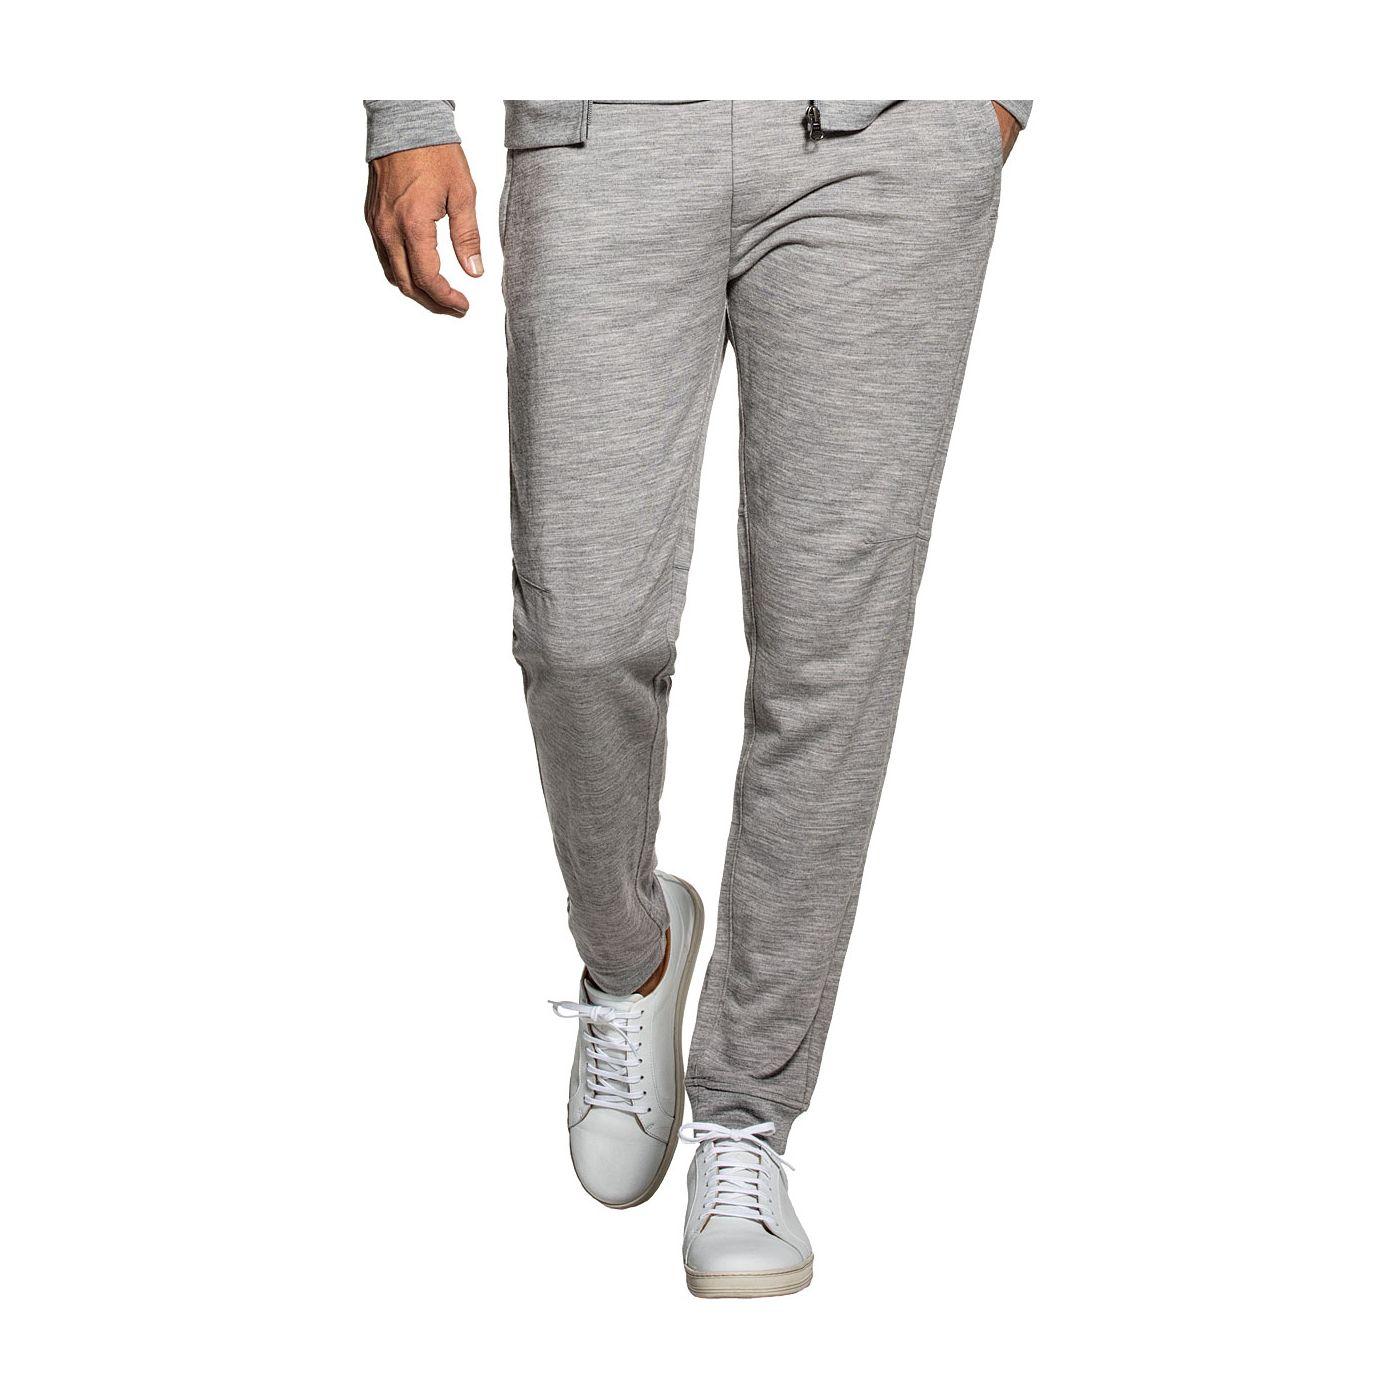 Sweatpants for men made of Merino wool in Grey